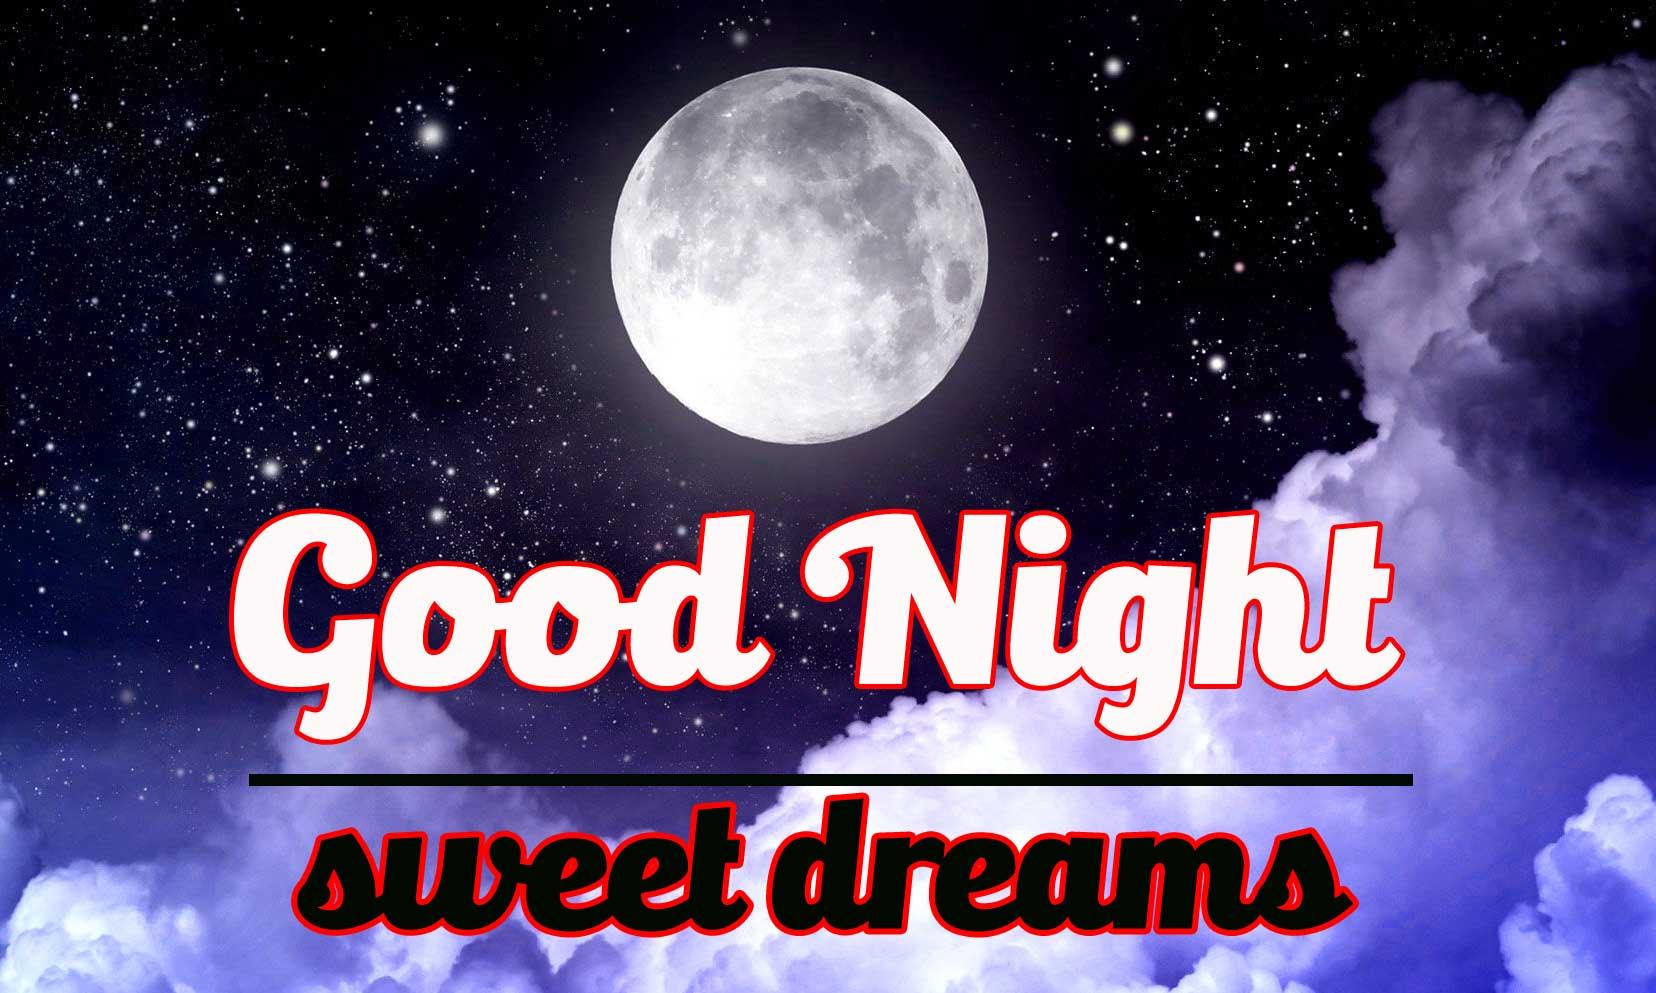 Free 1080p Good Night Photo Download